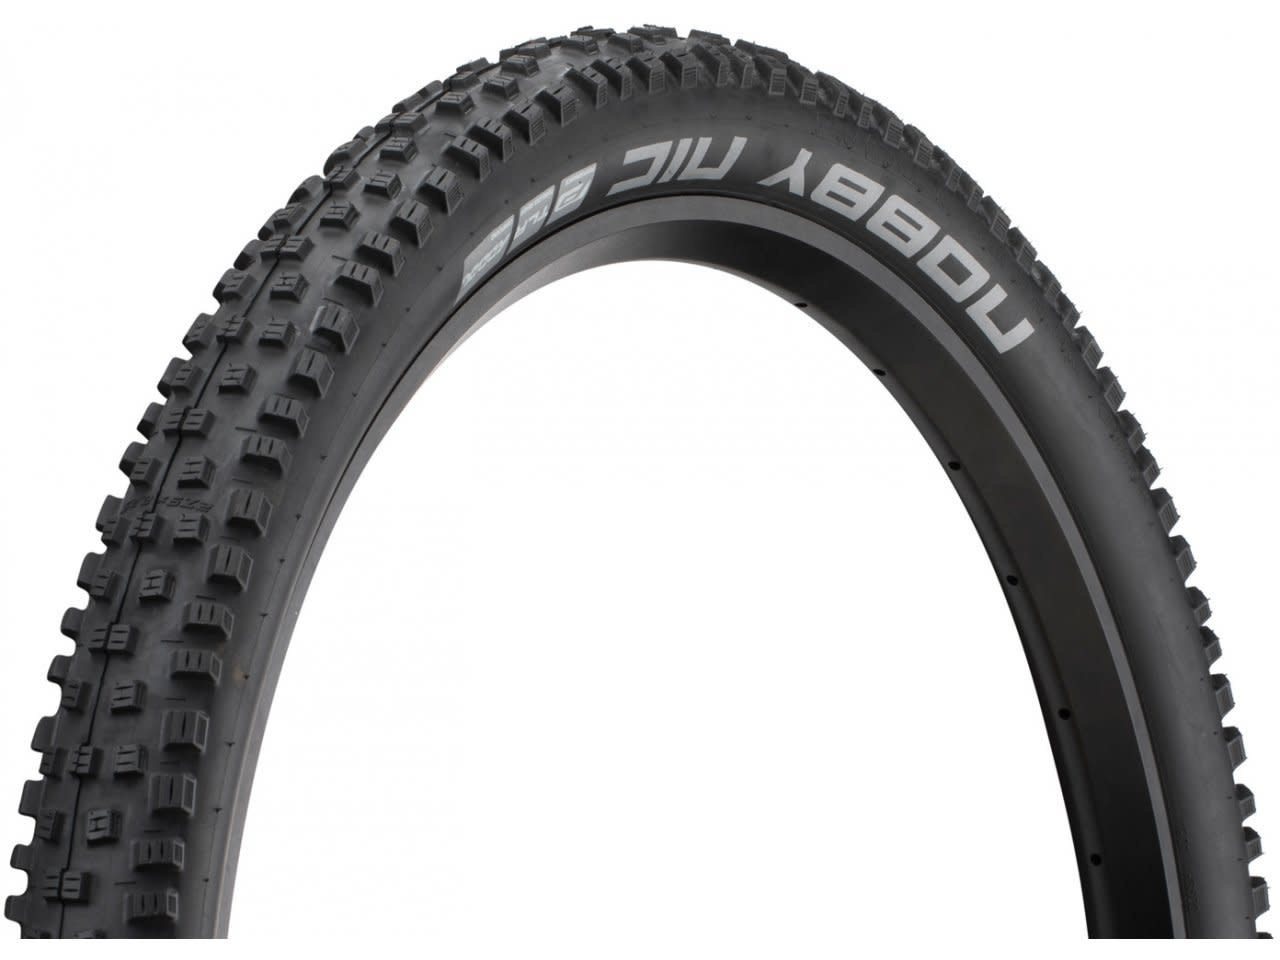 Schwalbe Tire 27.5 x 2.25 Nobby Nic Folding